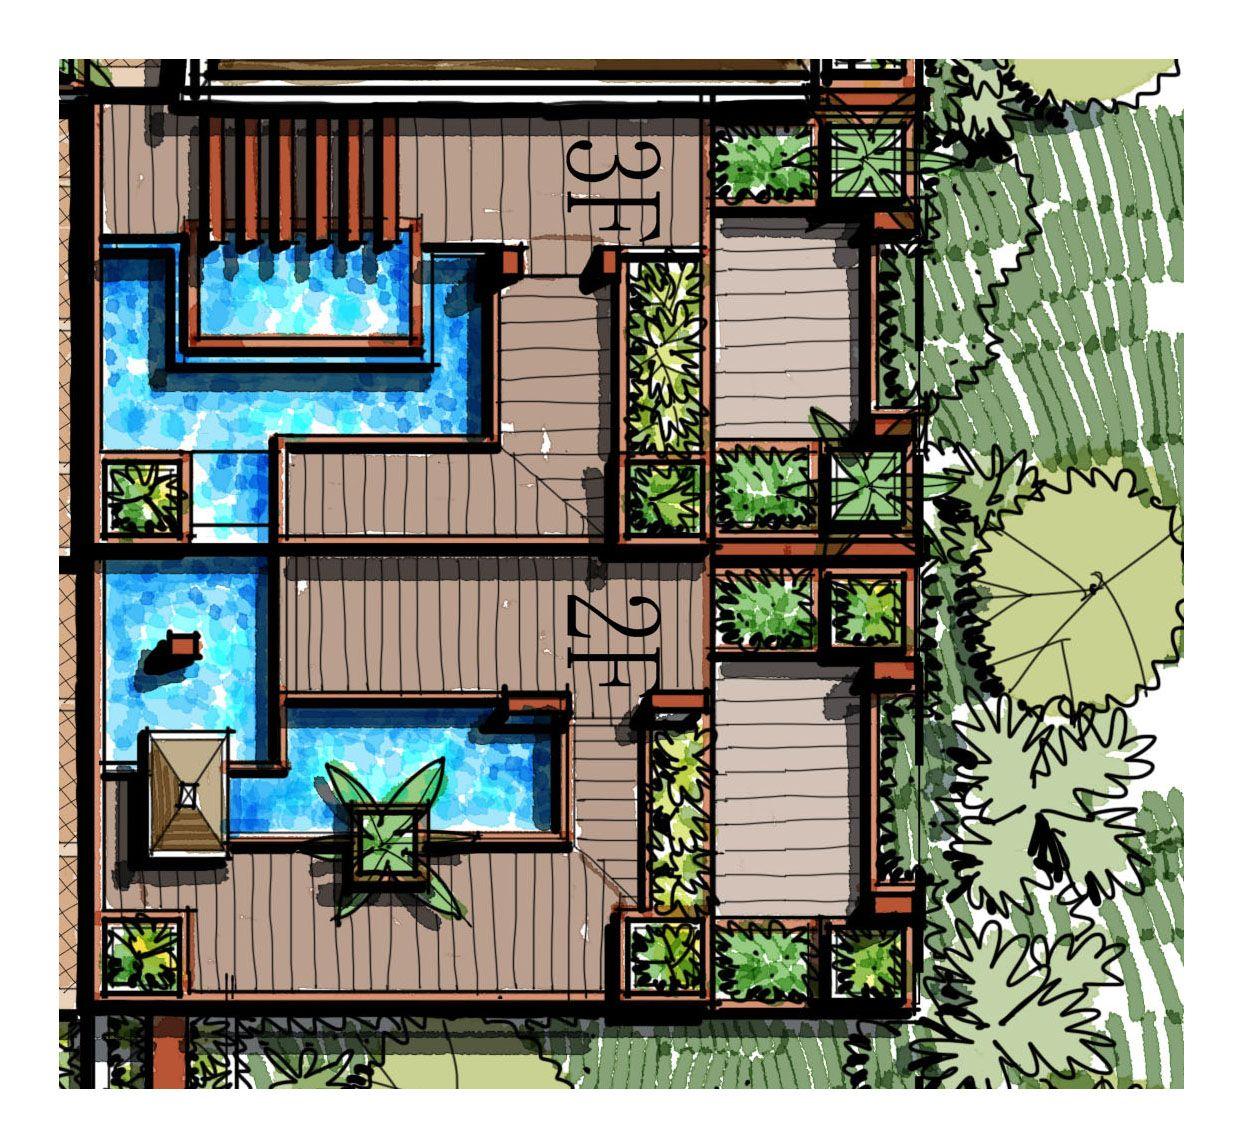 timber deck, water garden, pergola, trellis, pocket garden